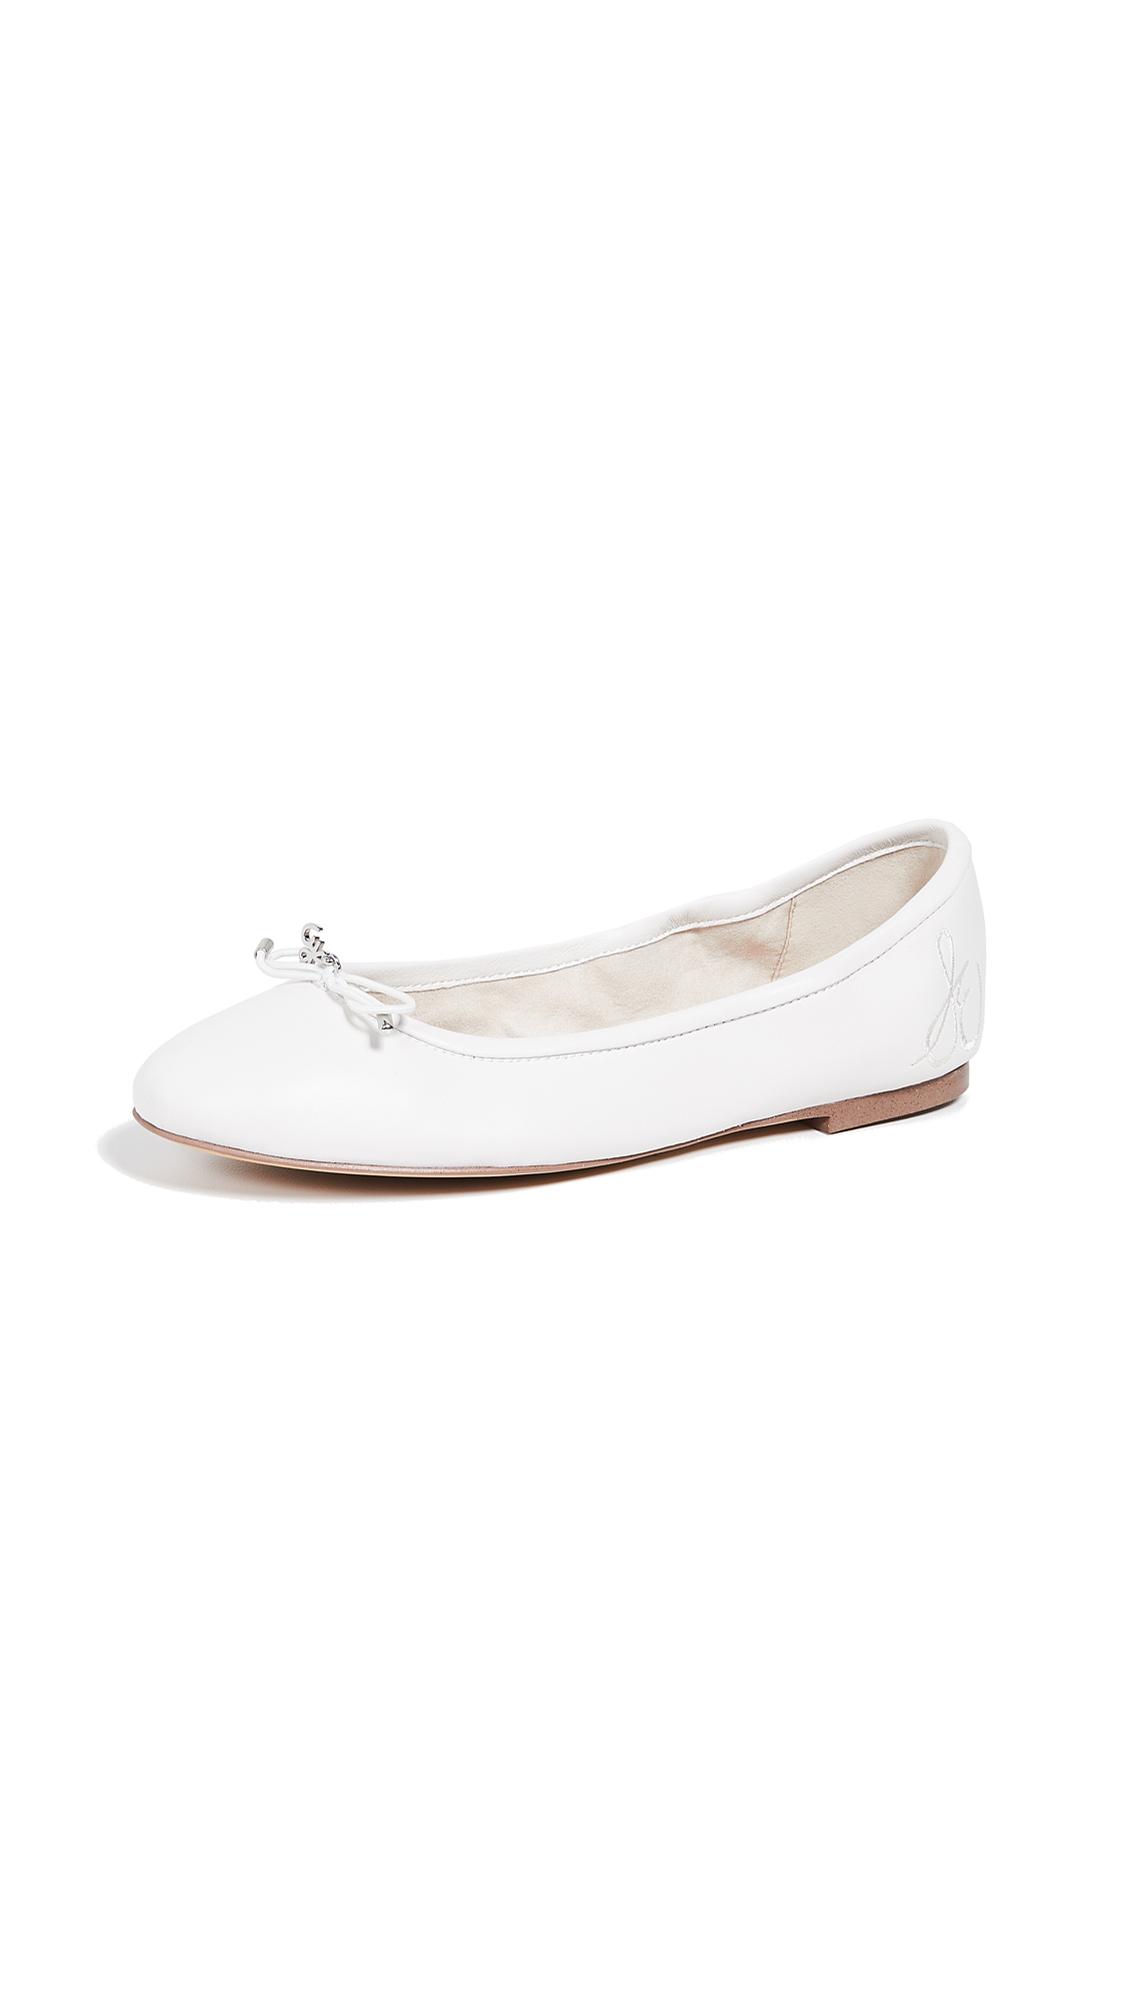 Sam Edelman Felicia Flats - Bright White